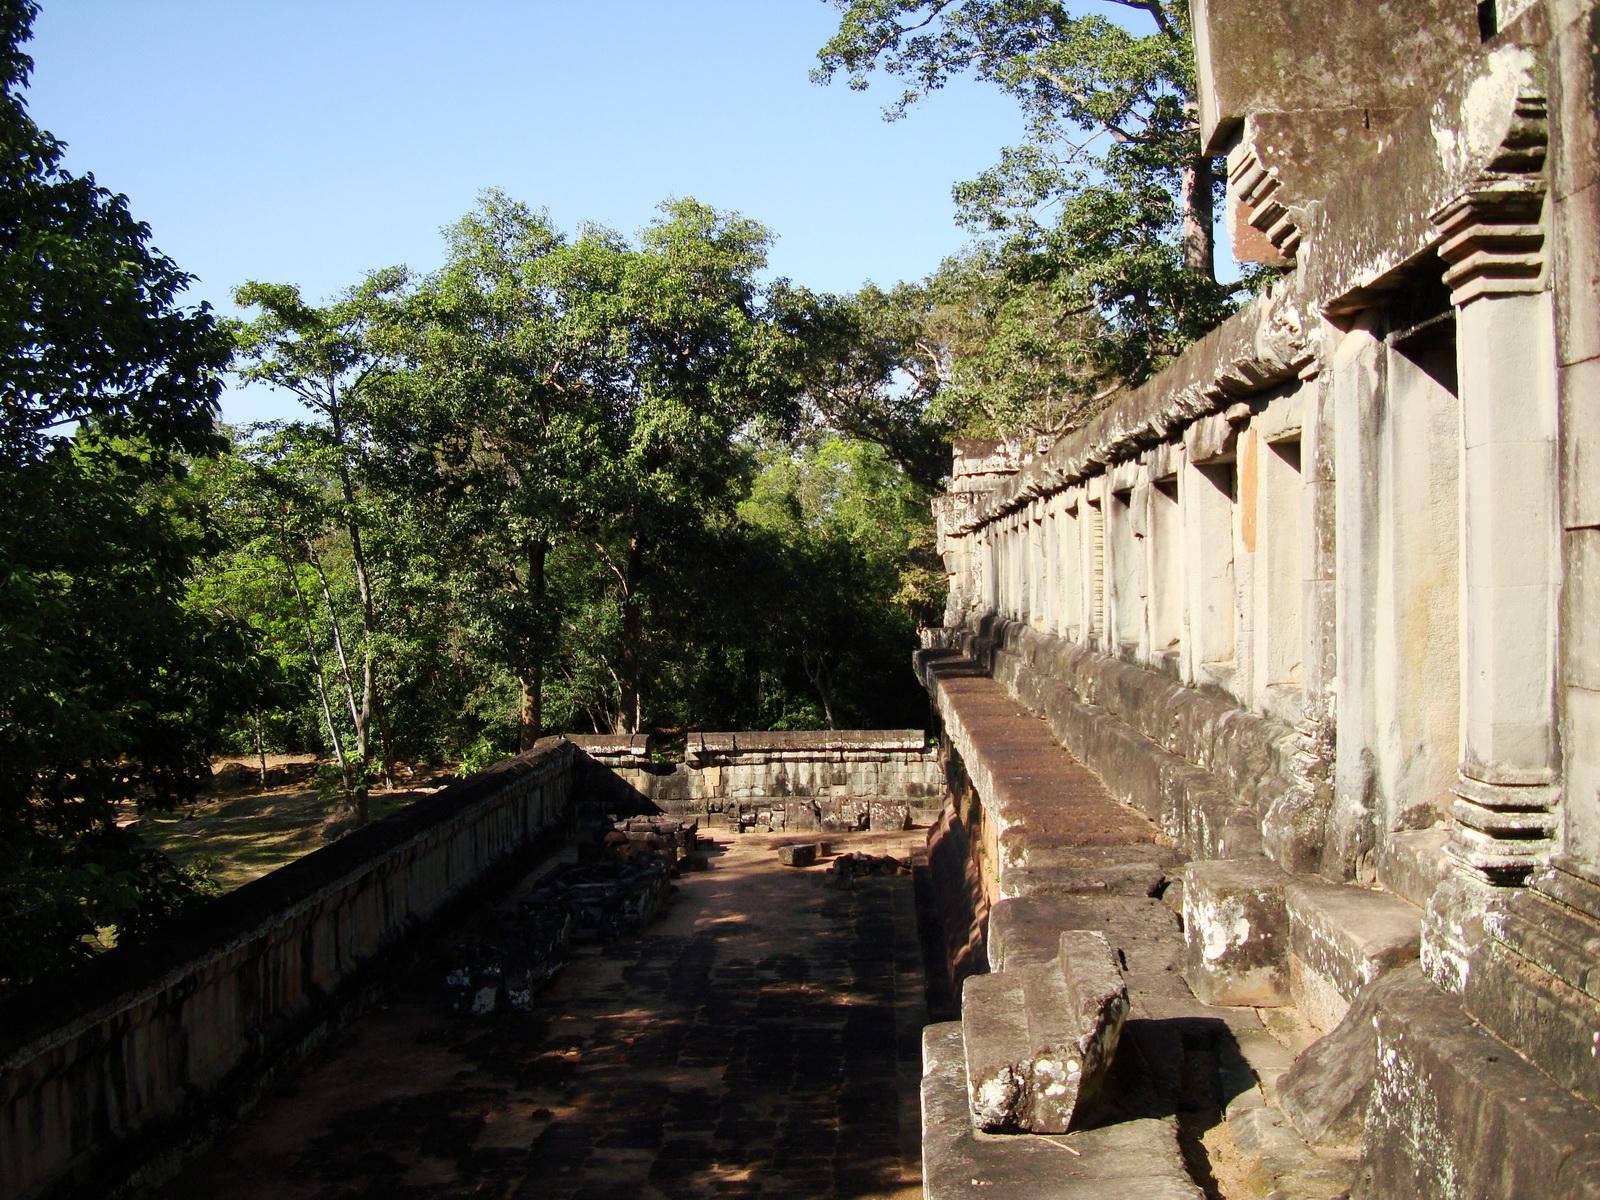 Facing NW Ta Keo Temple mountain Angkor Siem Reap Cambodia 01